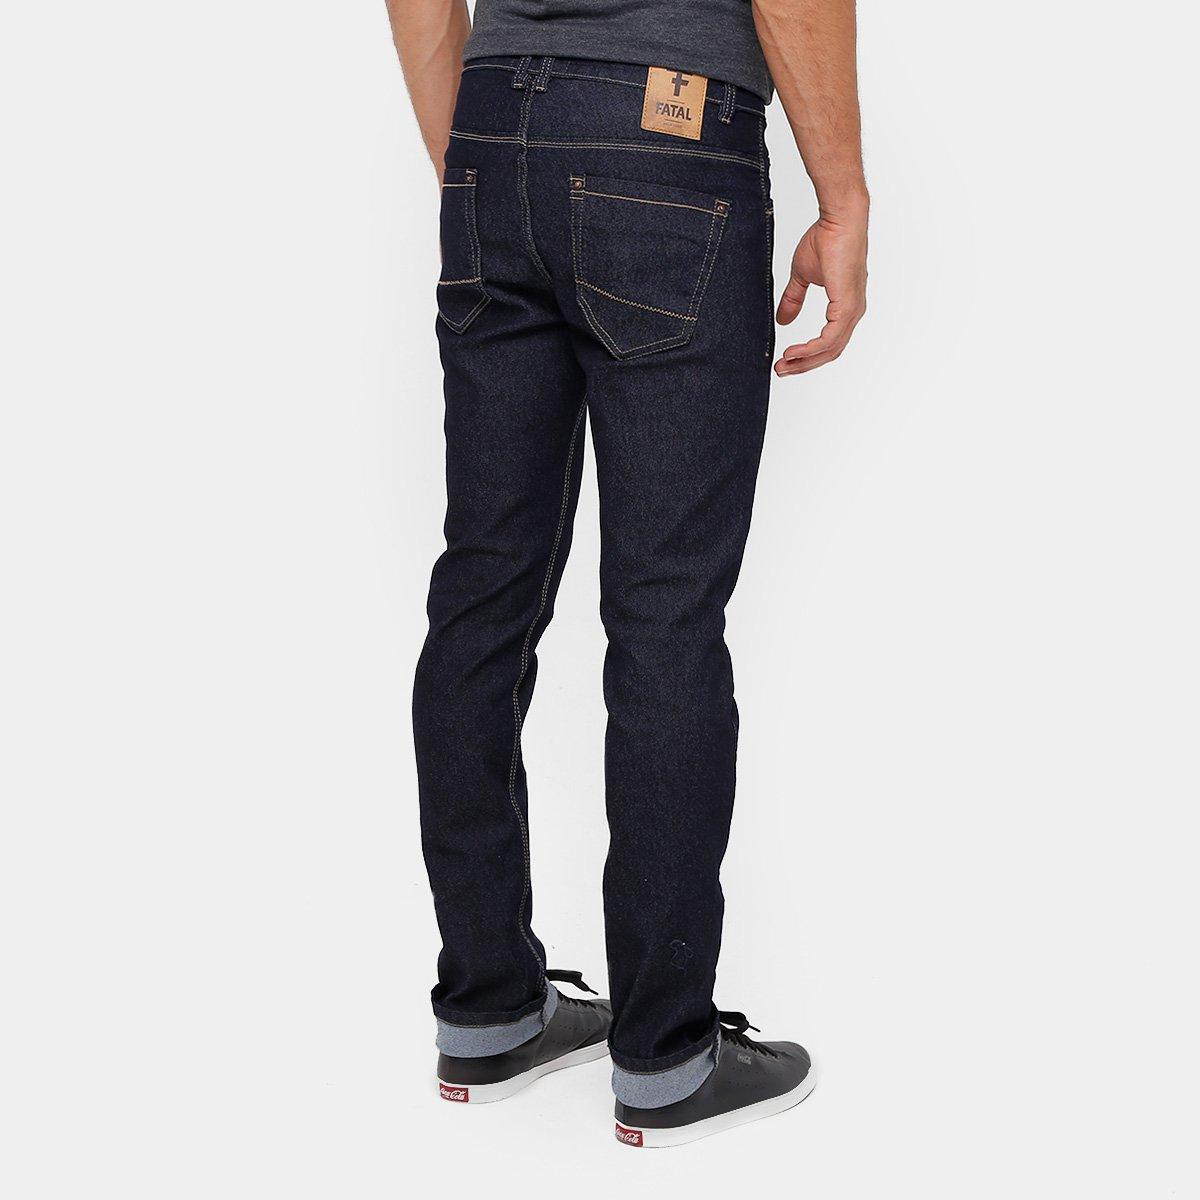 f0a2b6044 Calça Jeans Skinny Fatal Masculina  Calça Jeans Skinny Fatal Masculina ...